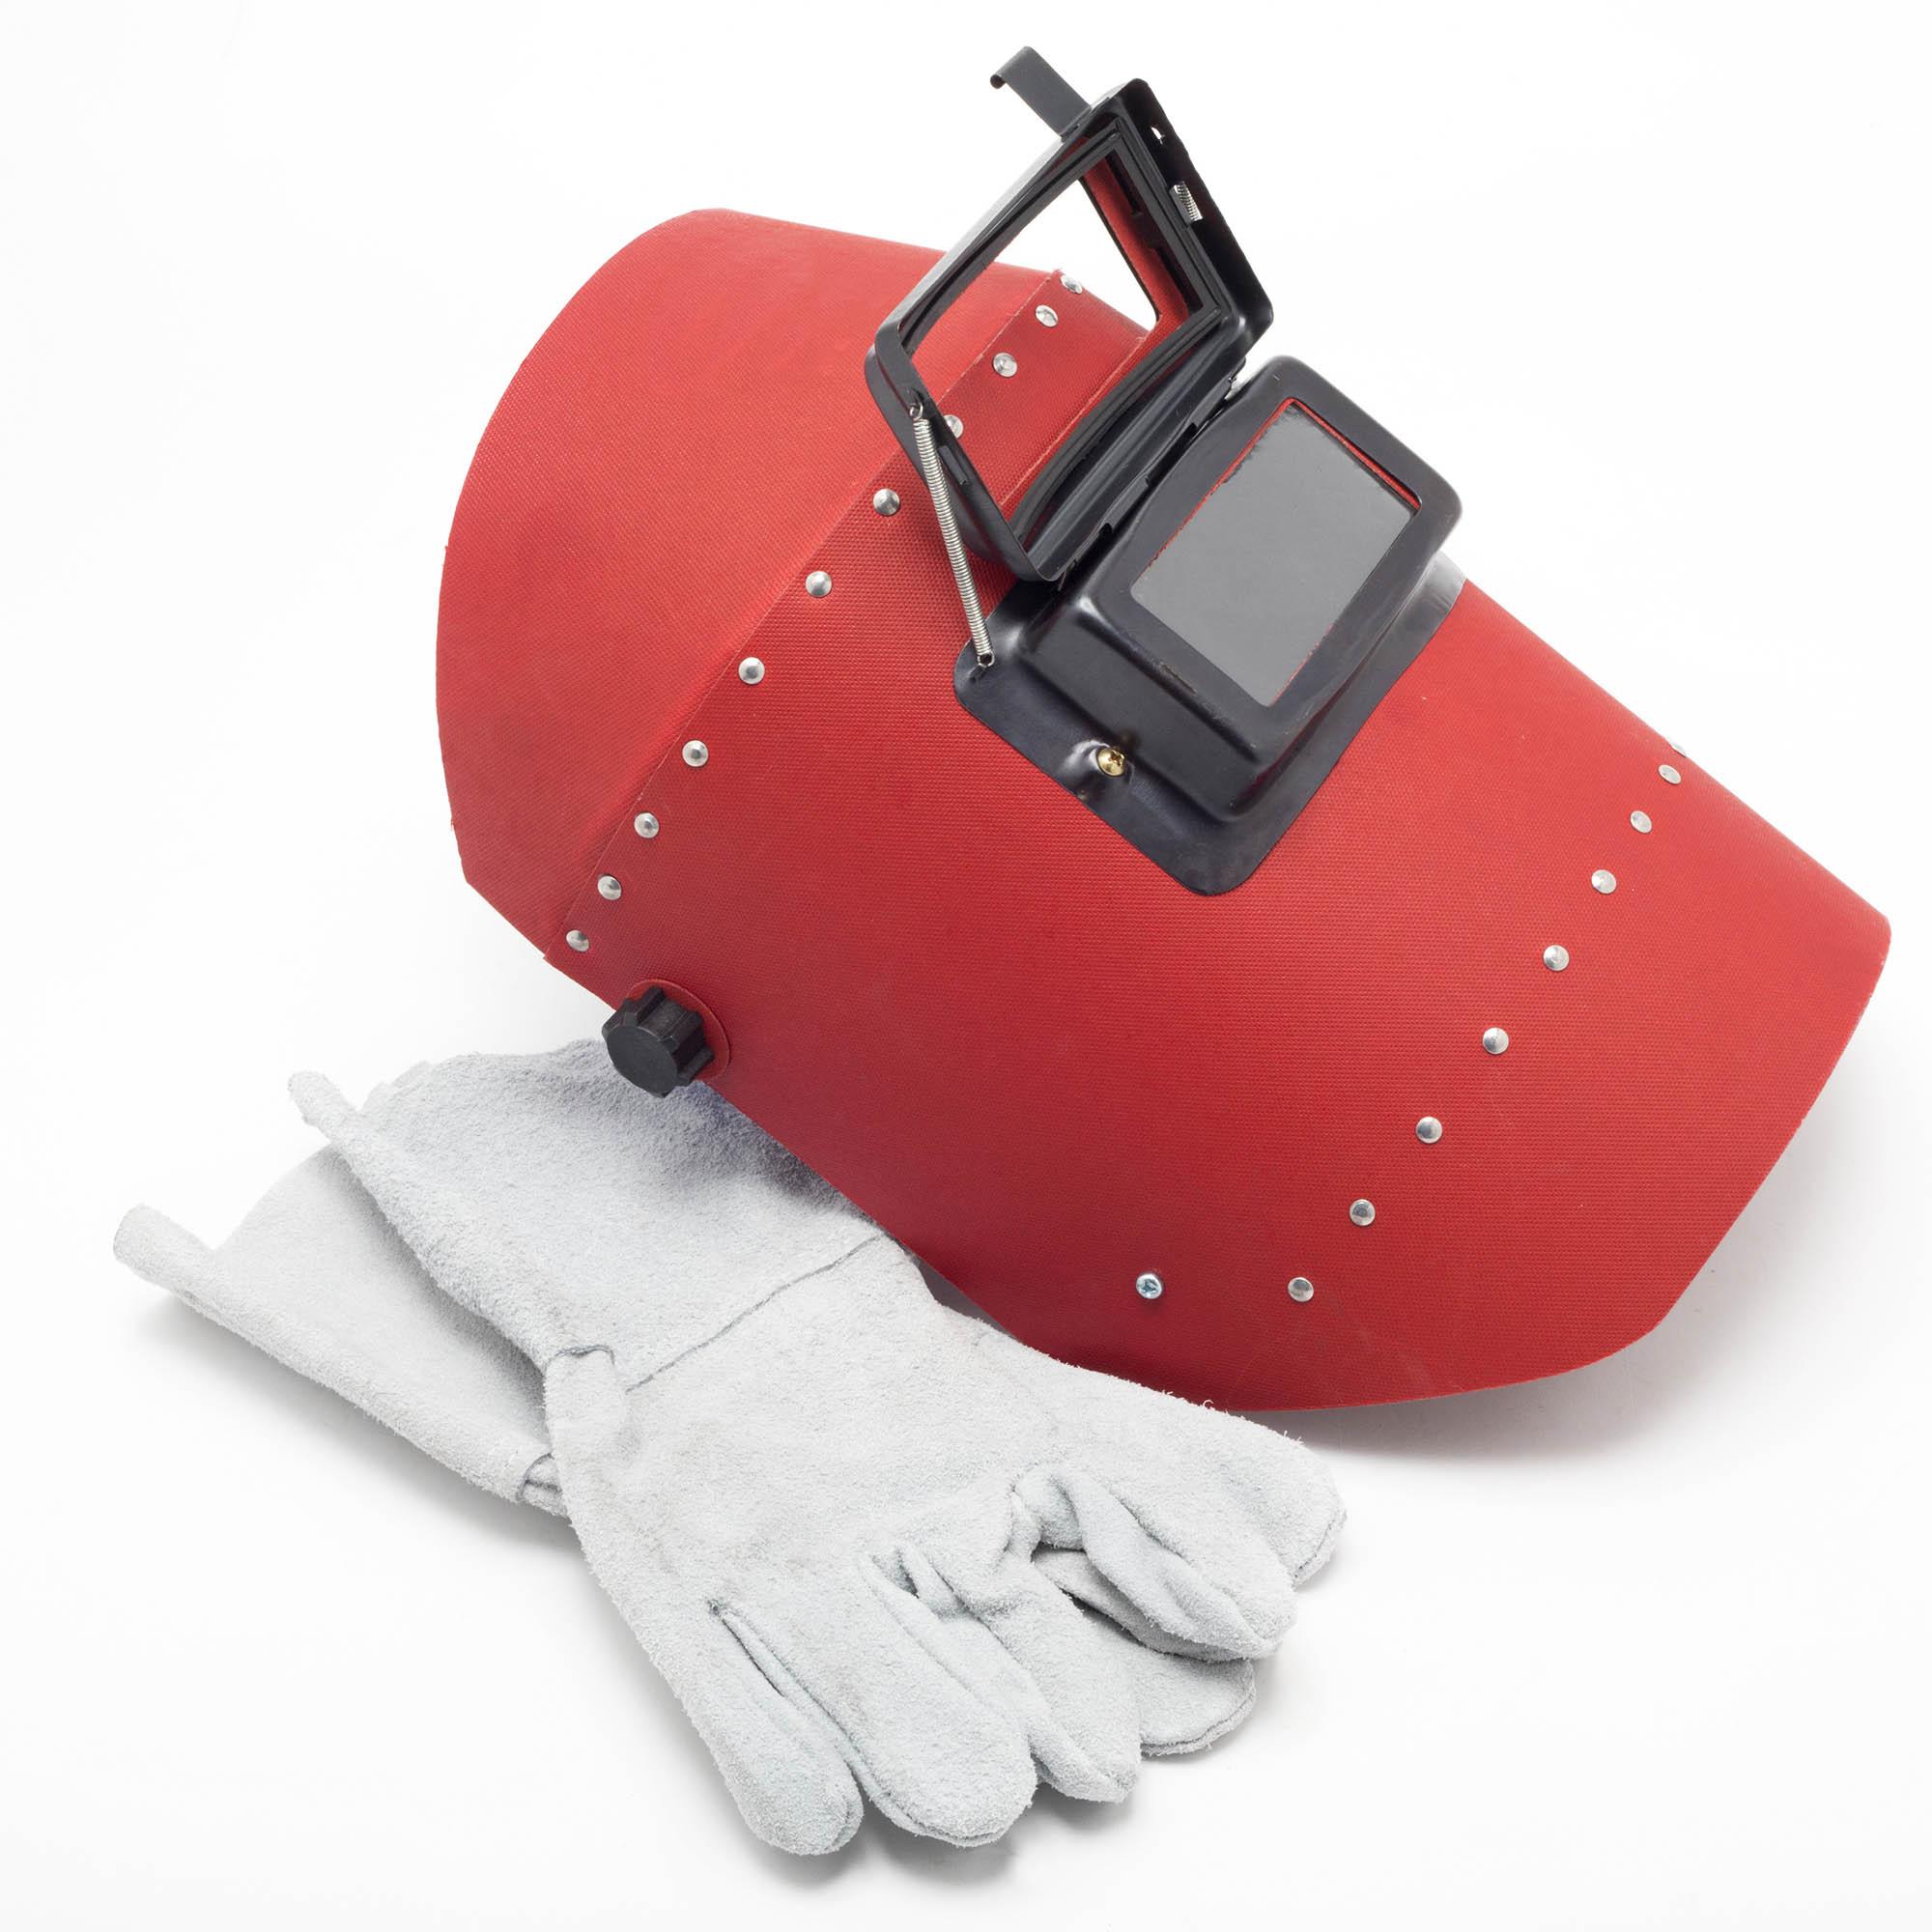 soldas-e-equipamentos